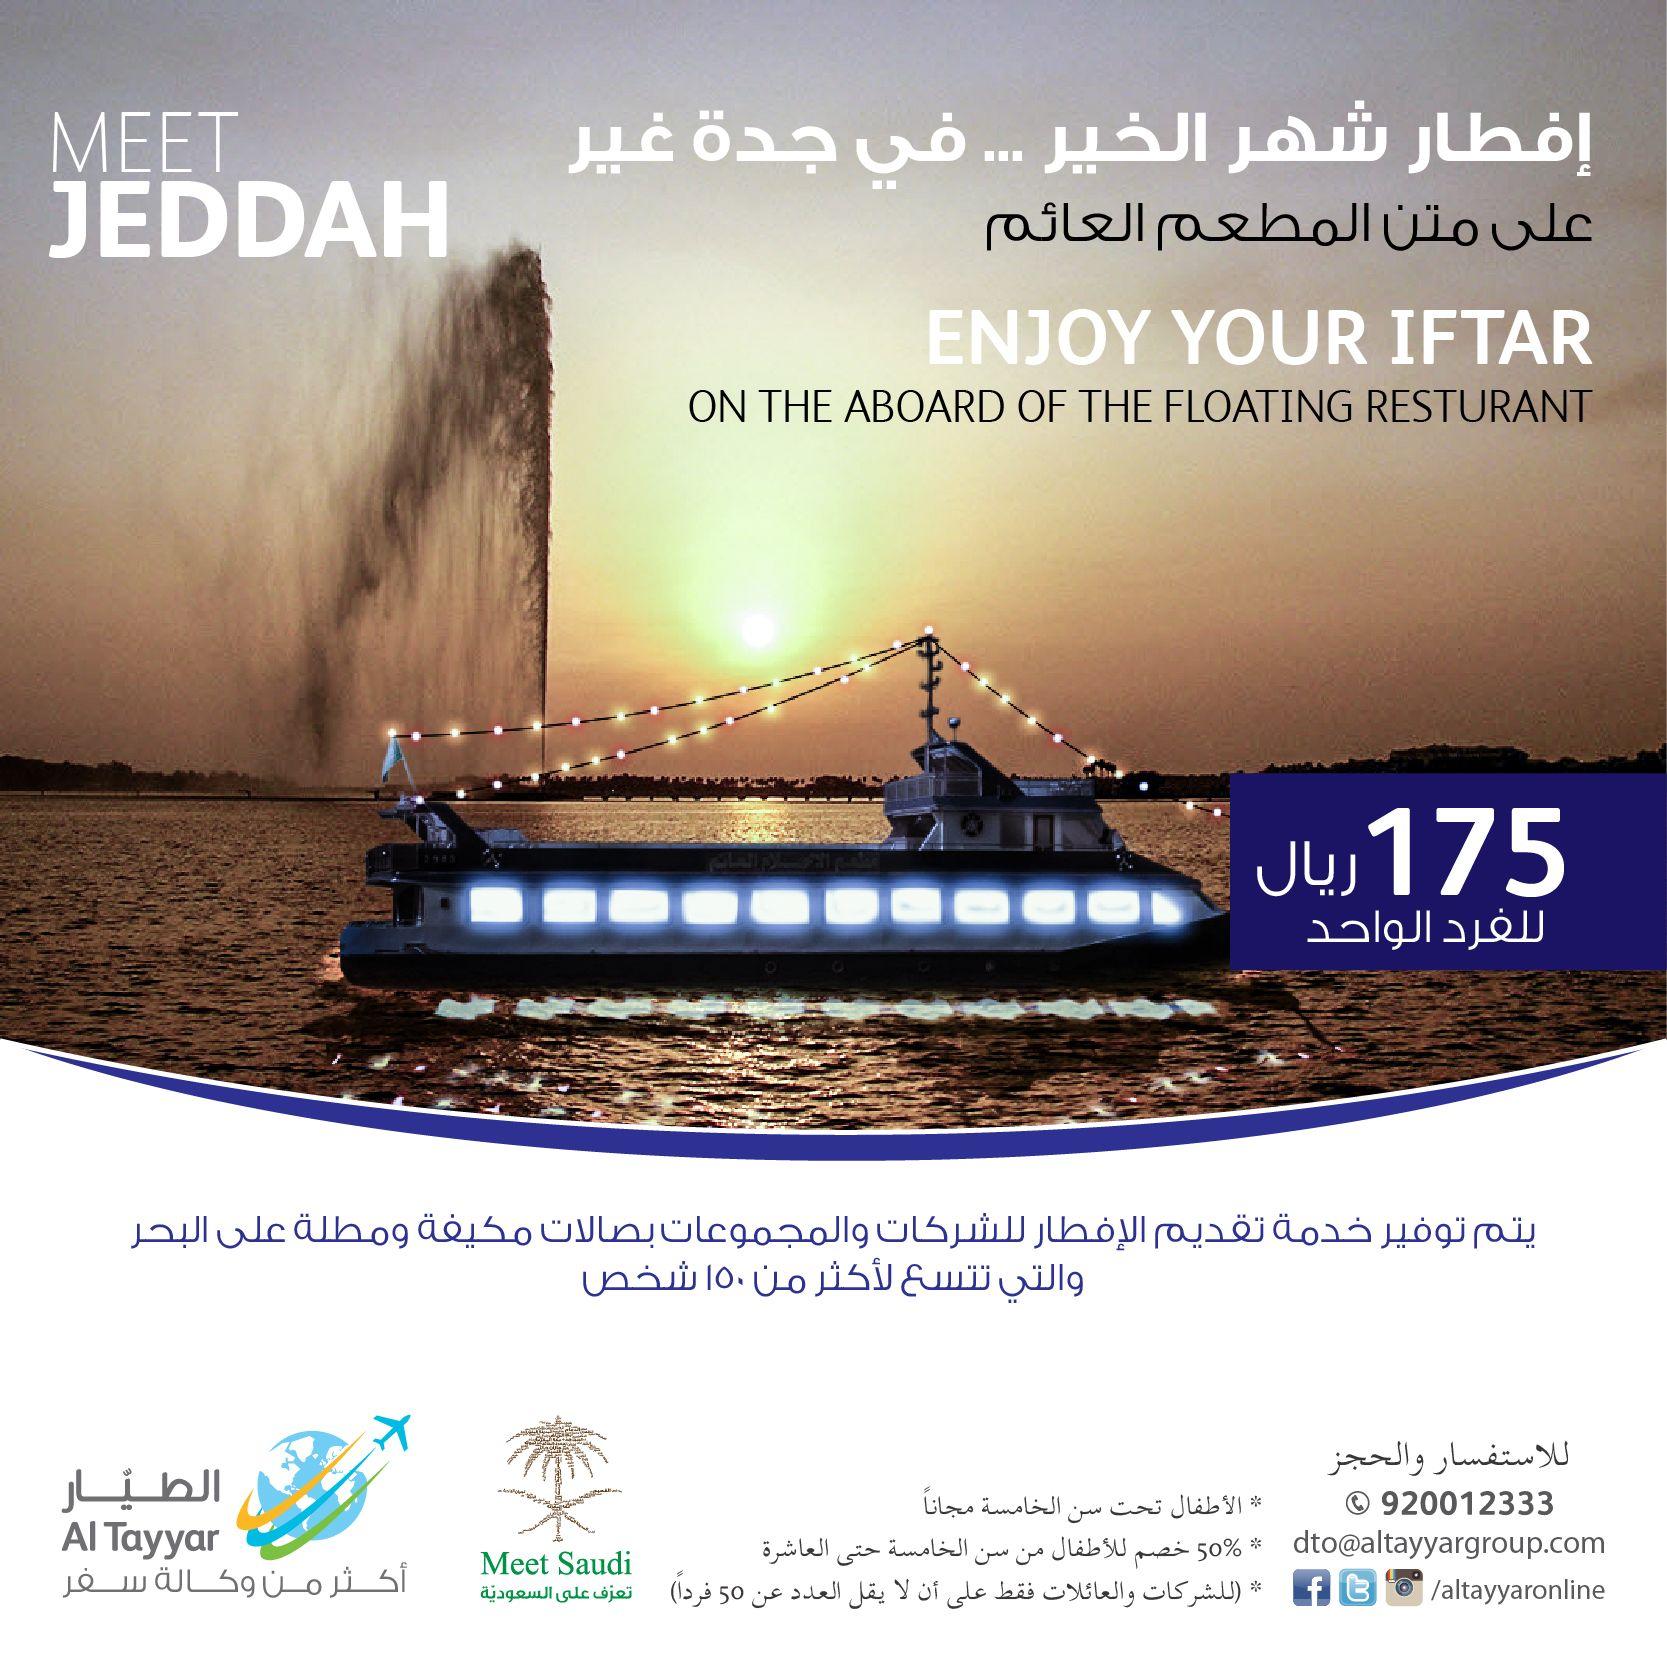 Pin By Altayyar Travel Group On عروض متنوعة على مدار العام Enjoyment Jeddah Resturant